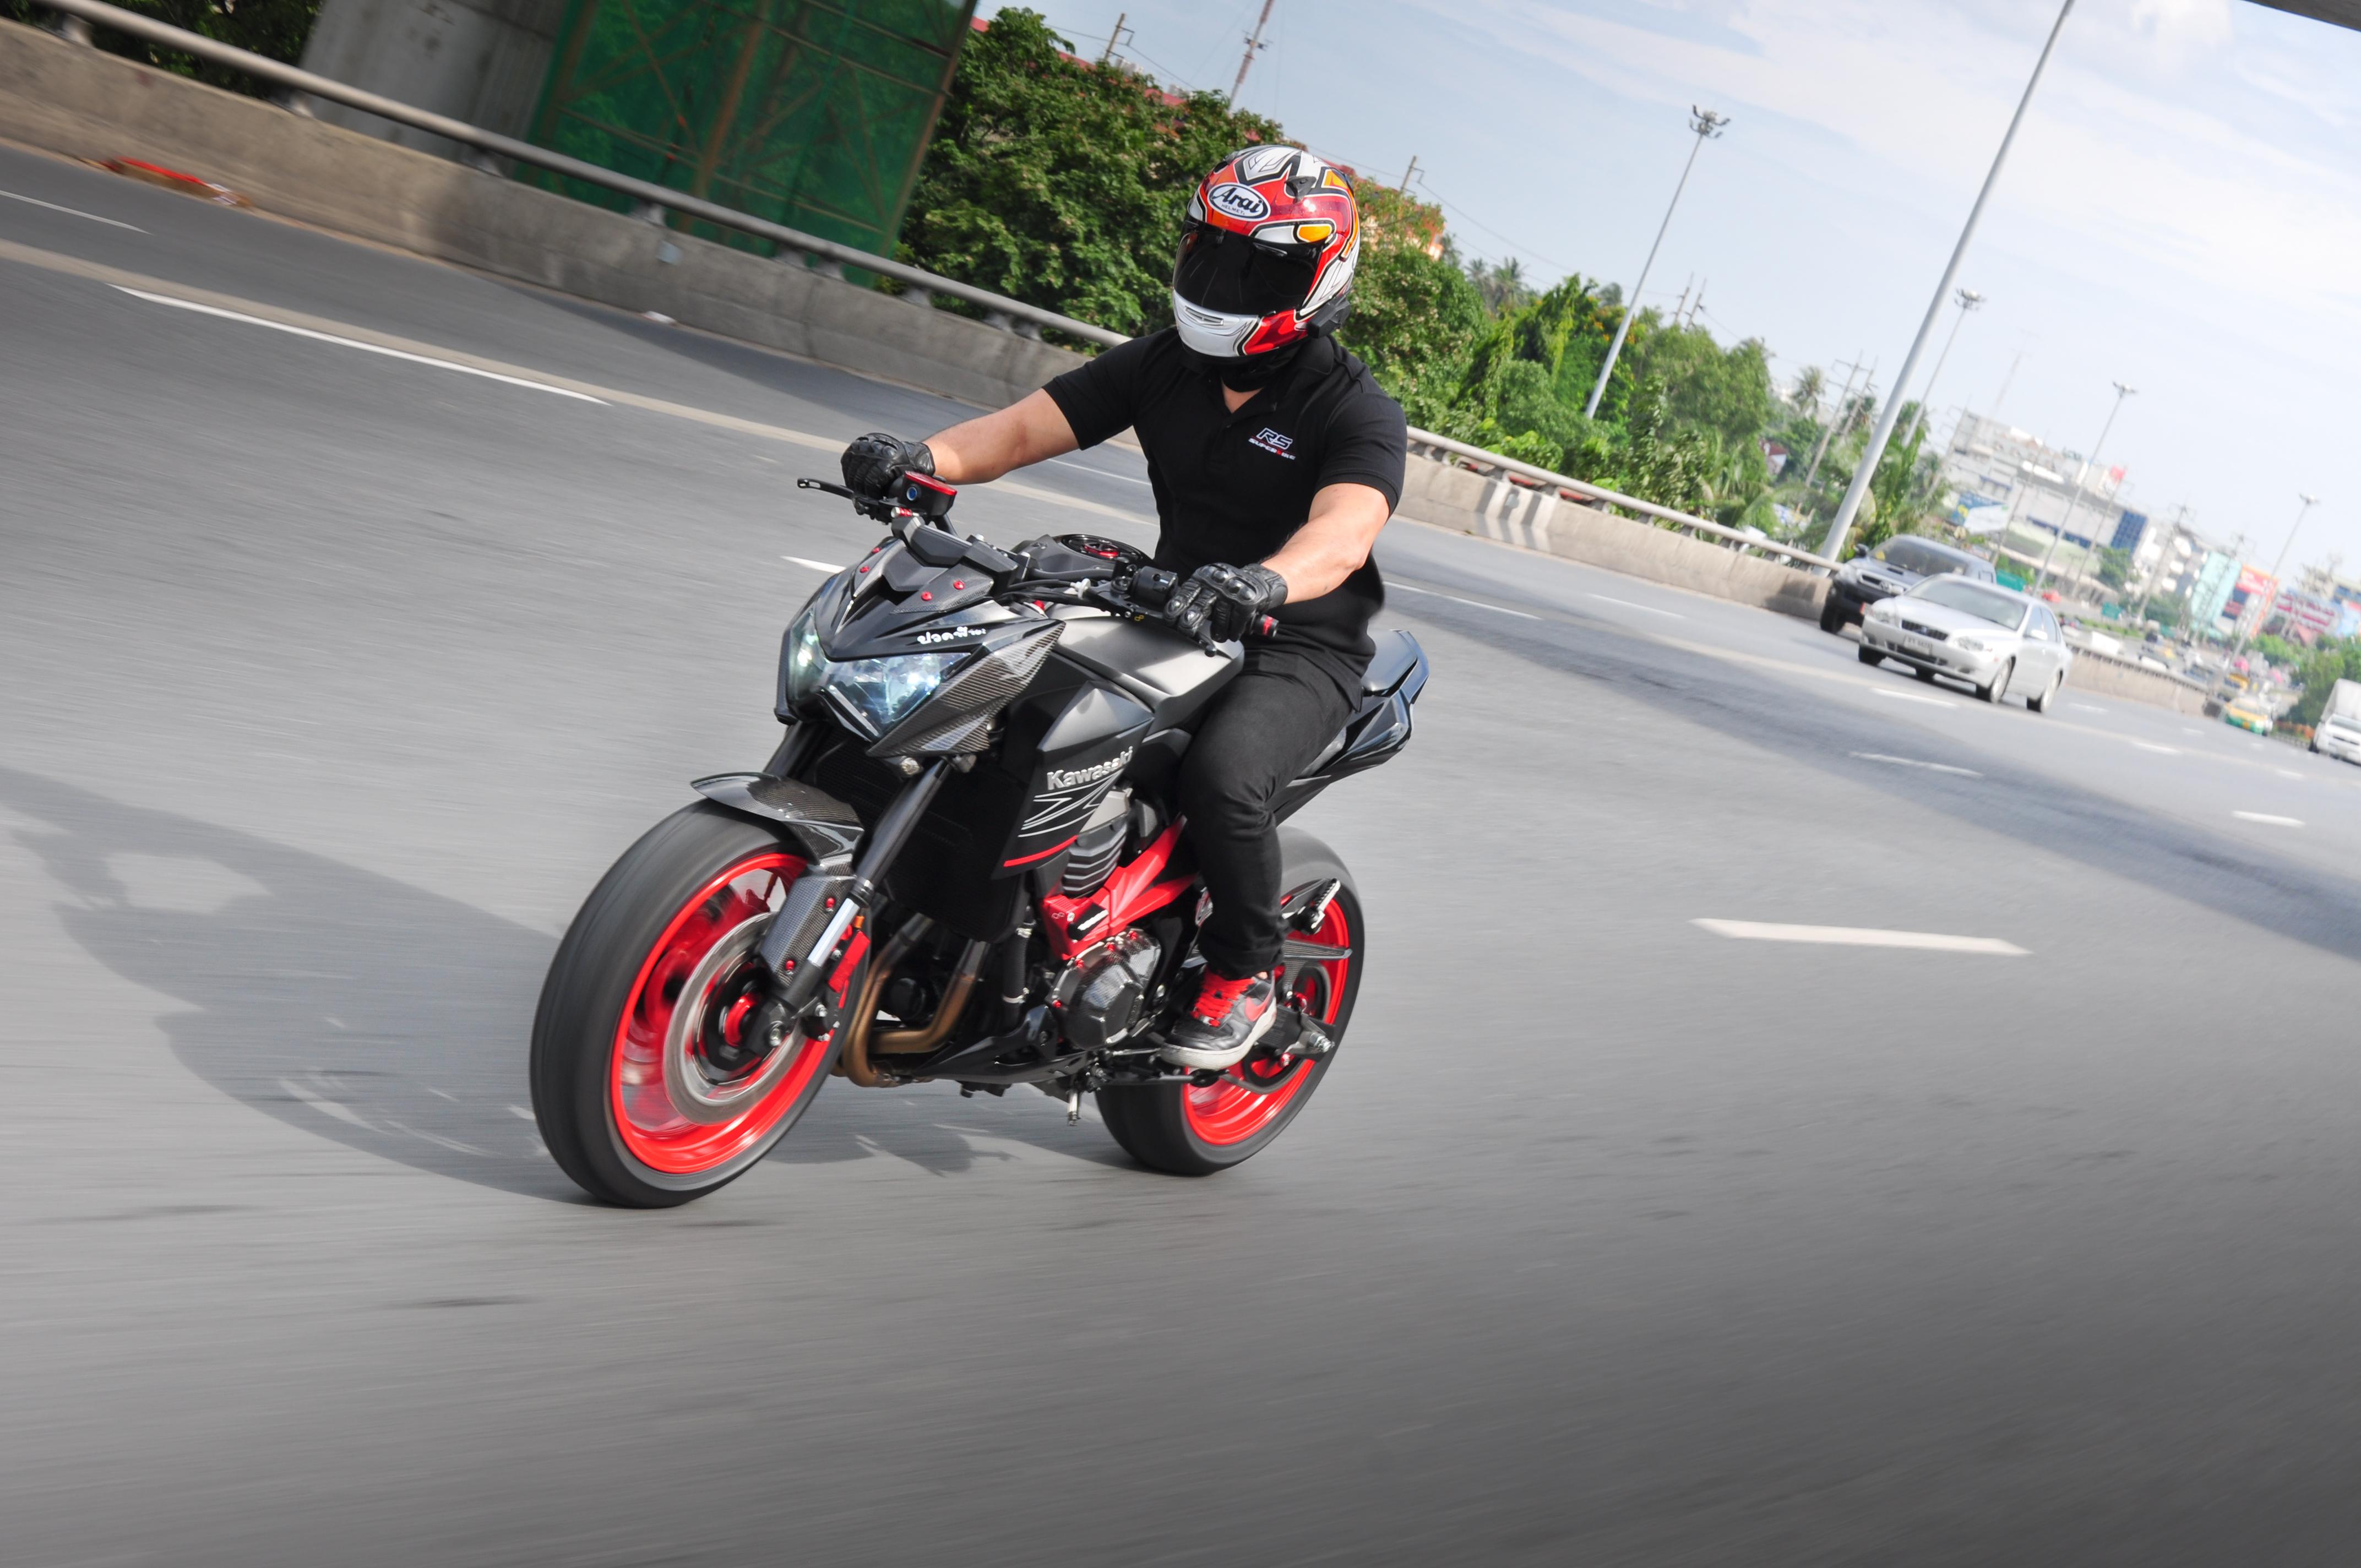 oatrs rssuperbike rs superbike โอ๊ตrs โอ๊ต z800 kawasaki